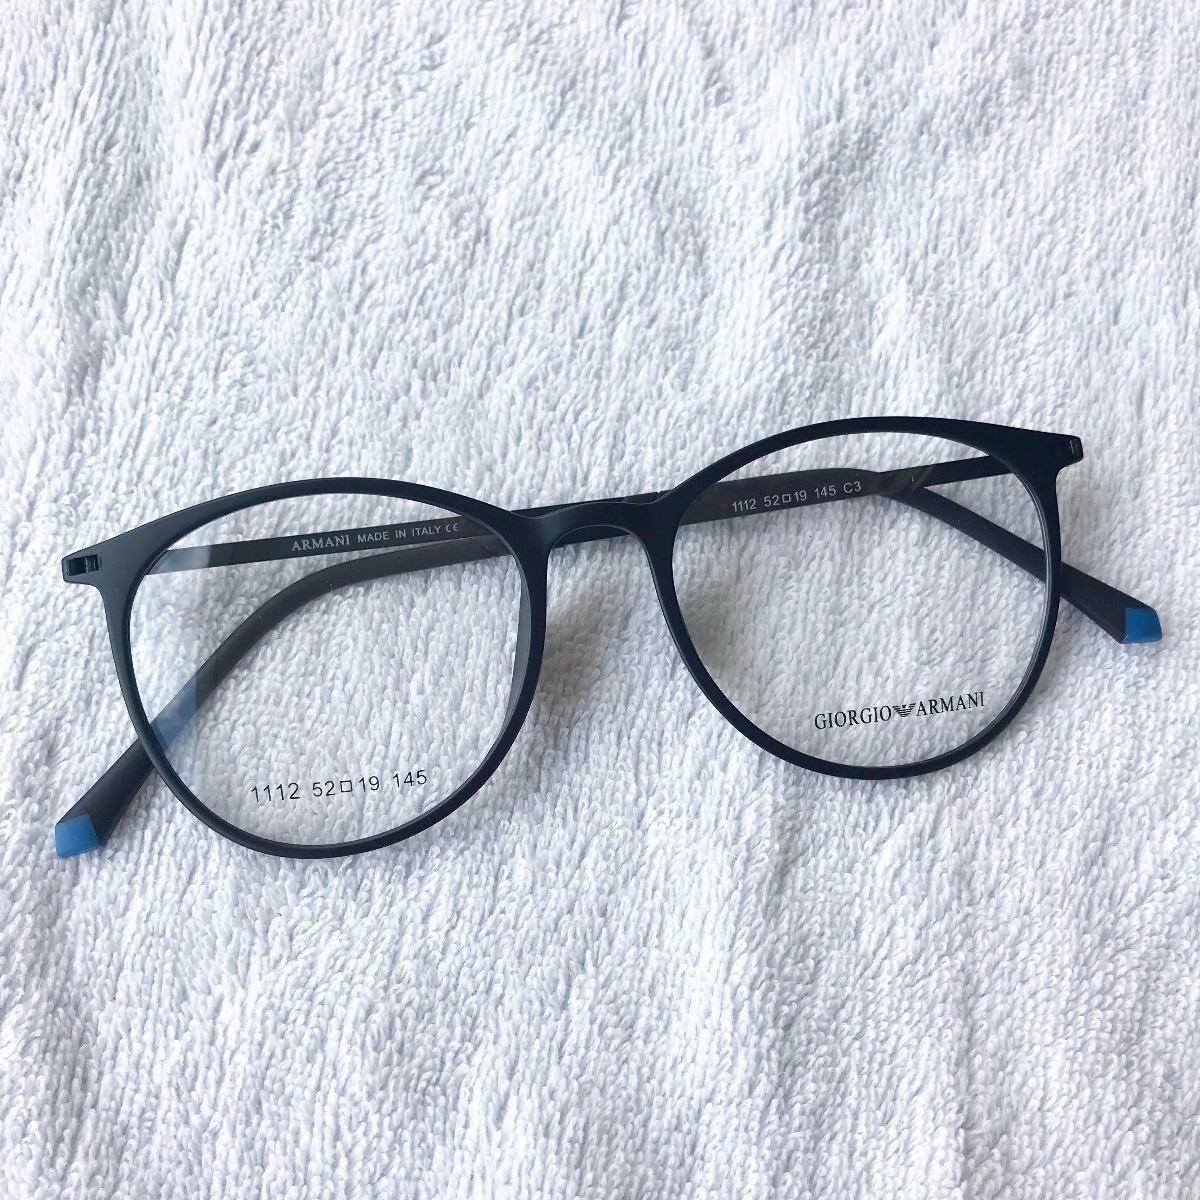 1eee0fbcce032 armação óculos armani gatinho redondo titânio preto. Carregando zoom.